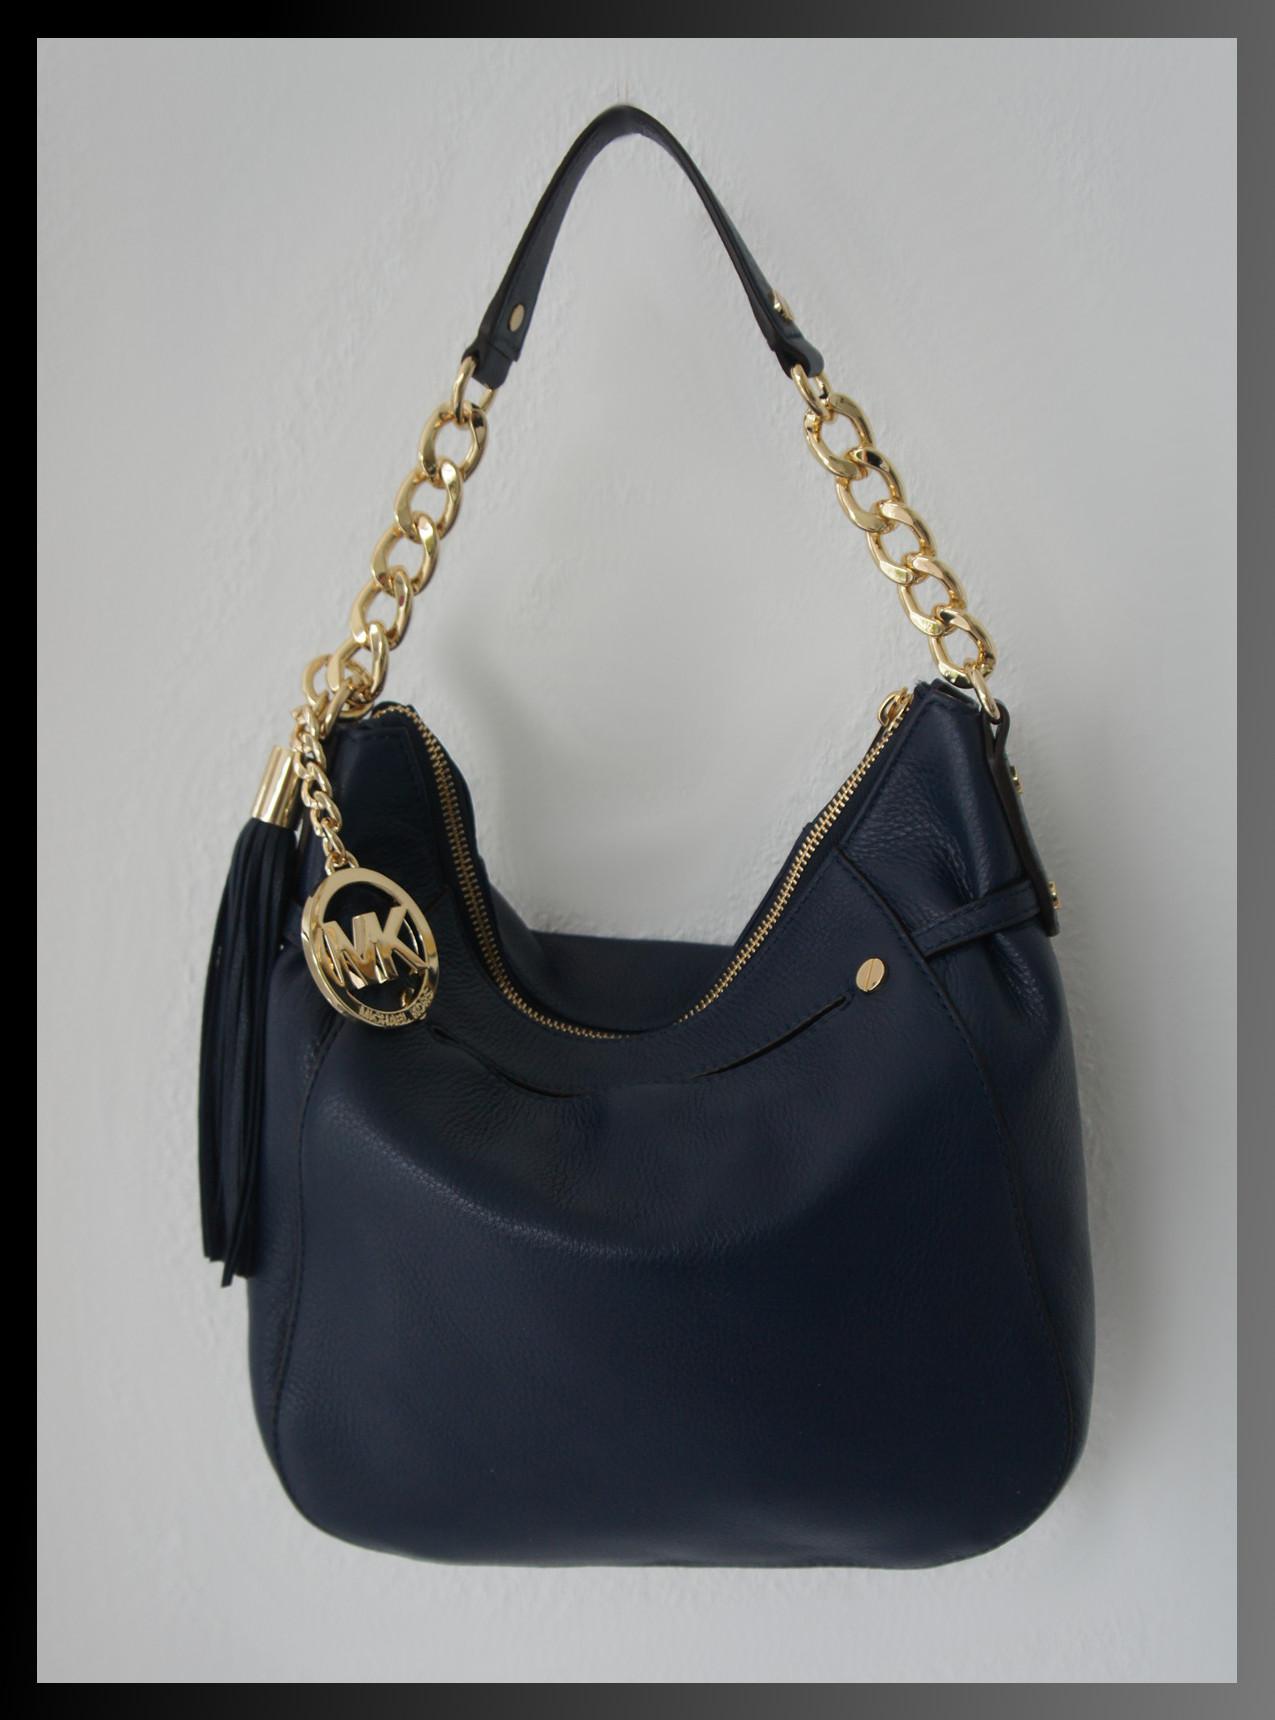 michael kors tasche handtasche zip top leder dunkelblau. Black Bedroom Furniture Sets. Home Design Ideas